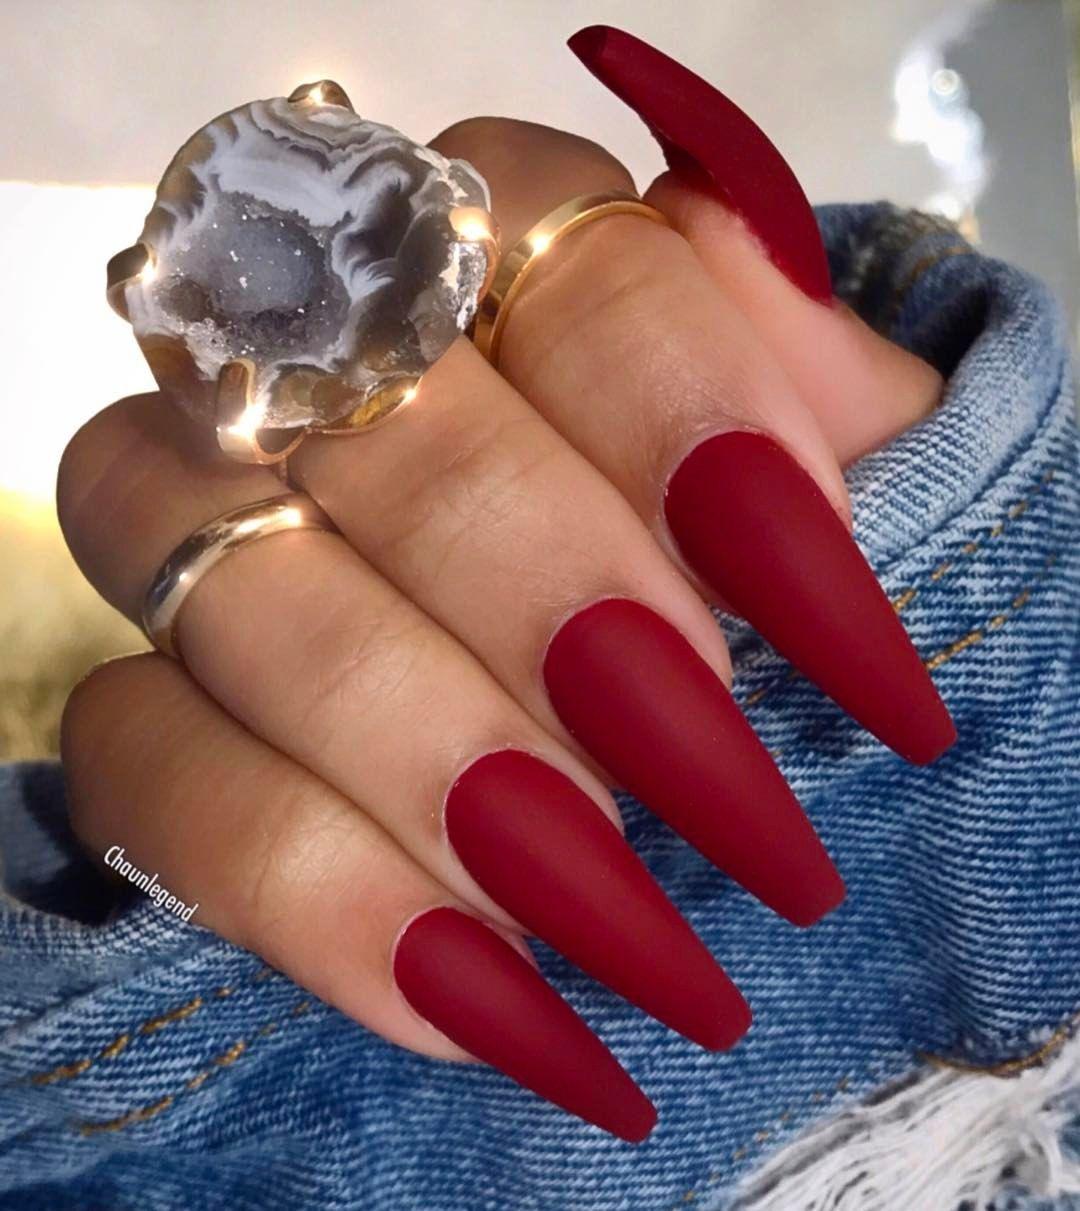 Ohmy Janai Red Acrylic Nails Dark Red Nails Fake Nails